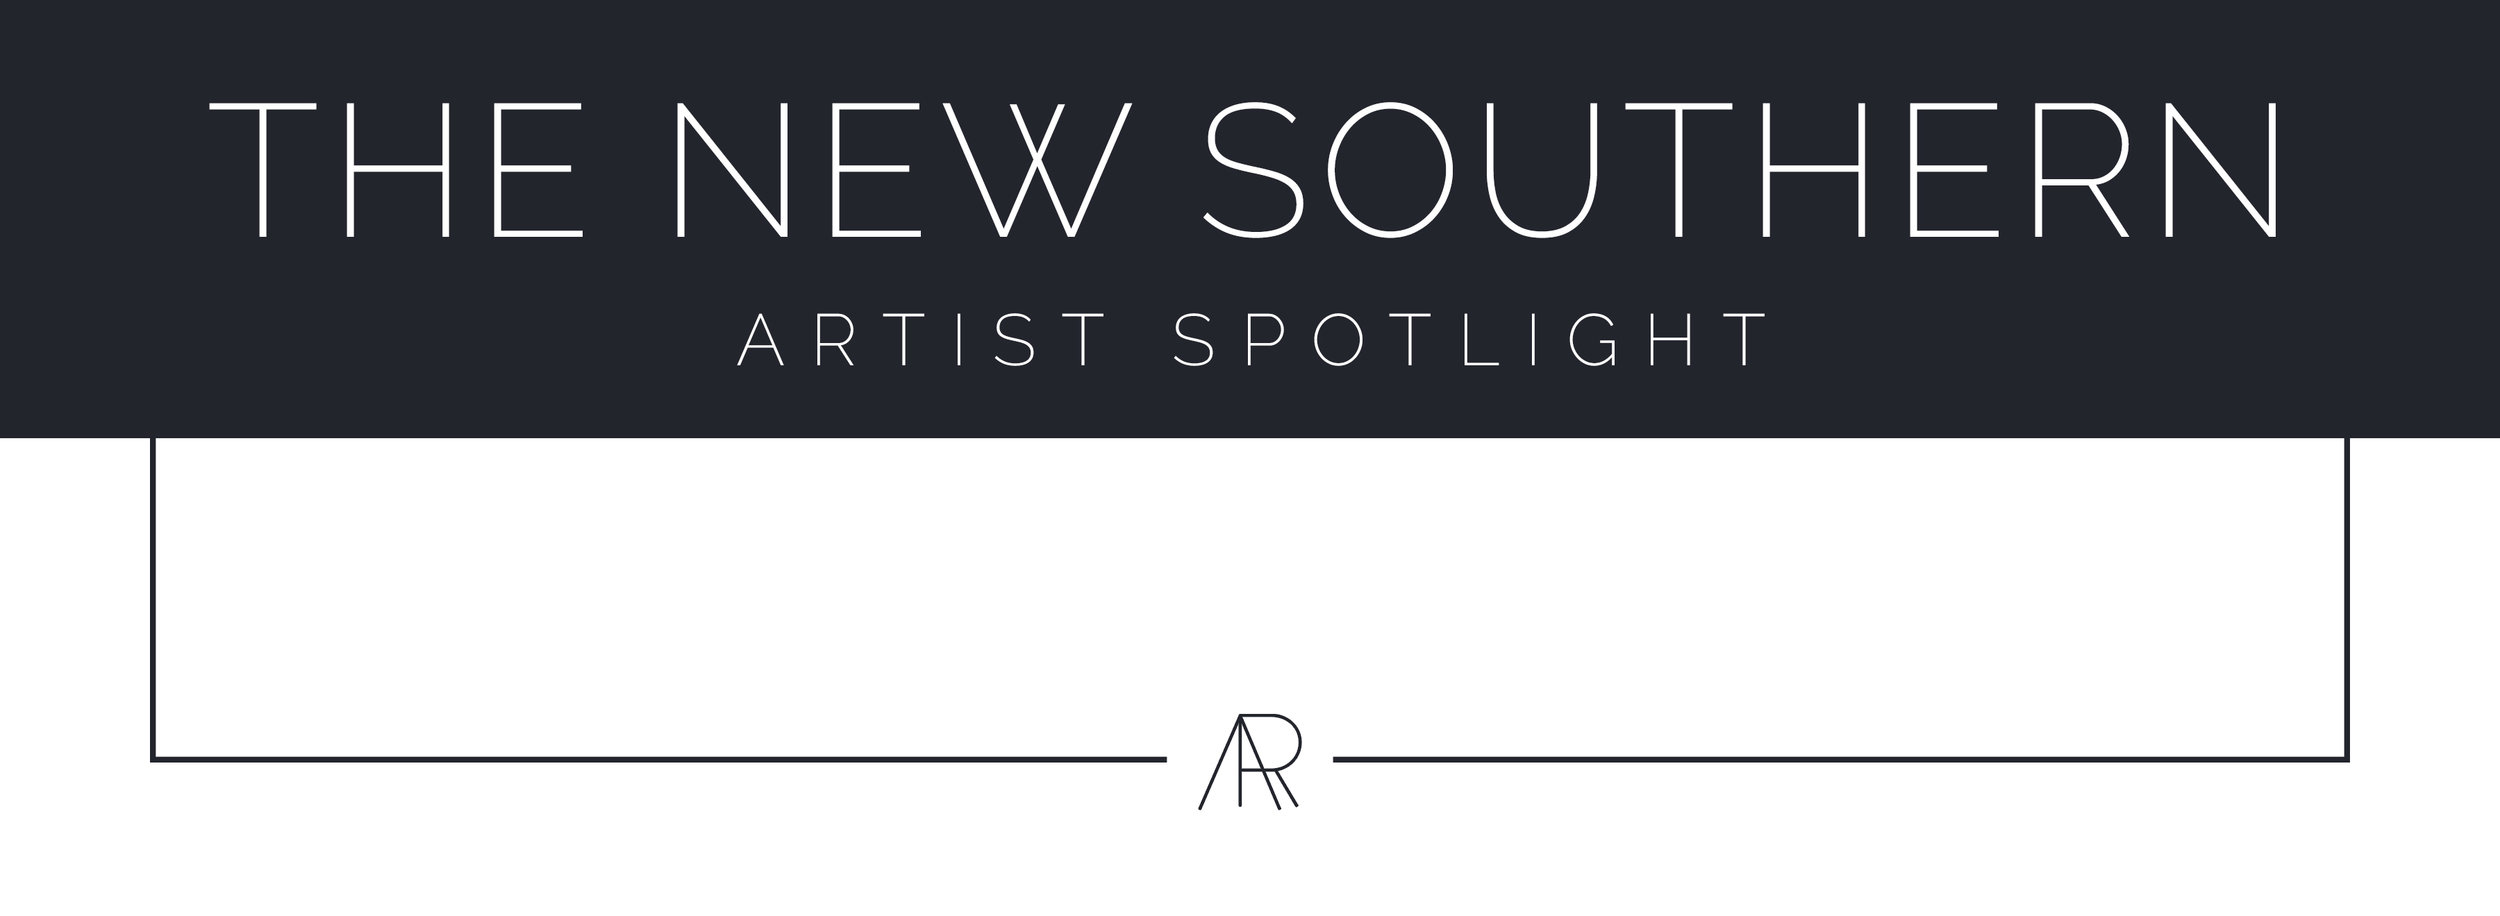 Alyssa Rosenheck's The New Southern Artist Spotlight with Hillary Butler, Abstract Fine Art Painter of Memphis, TN